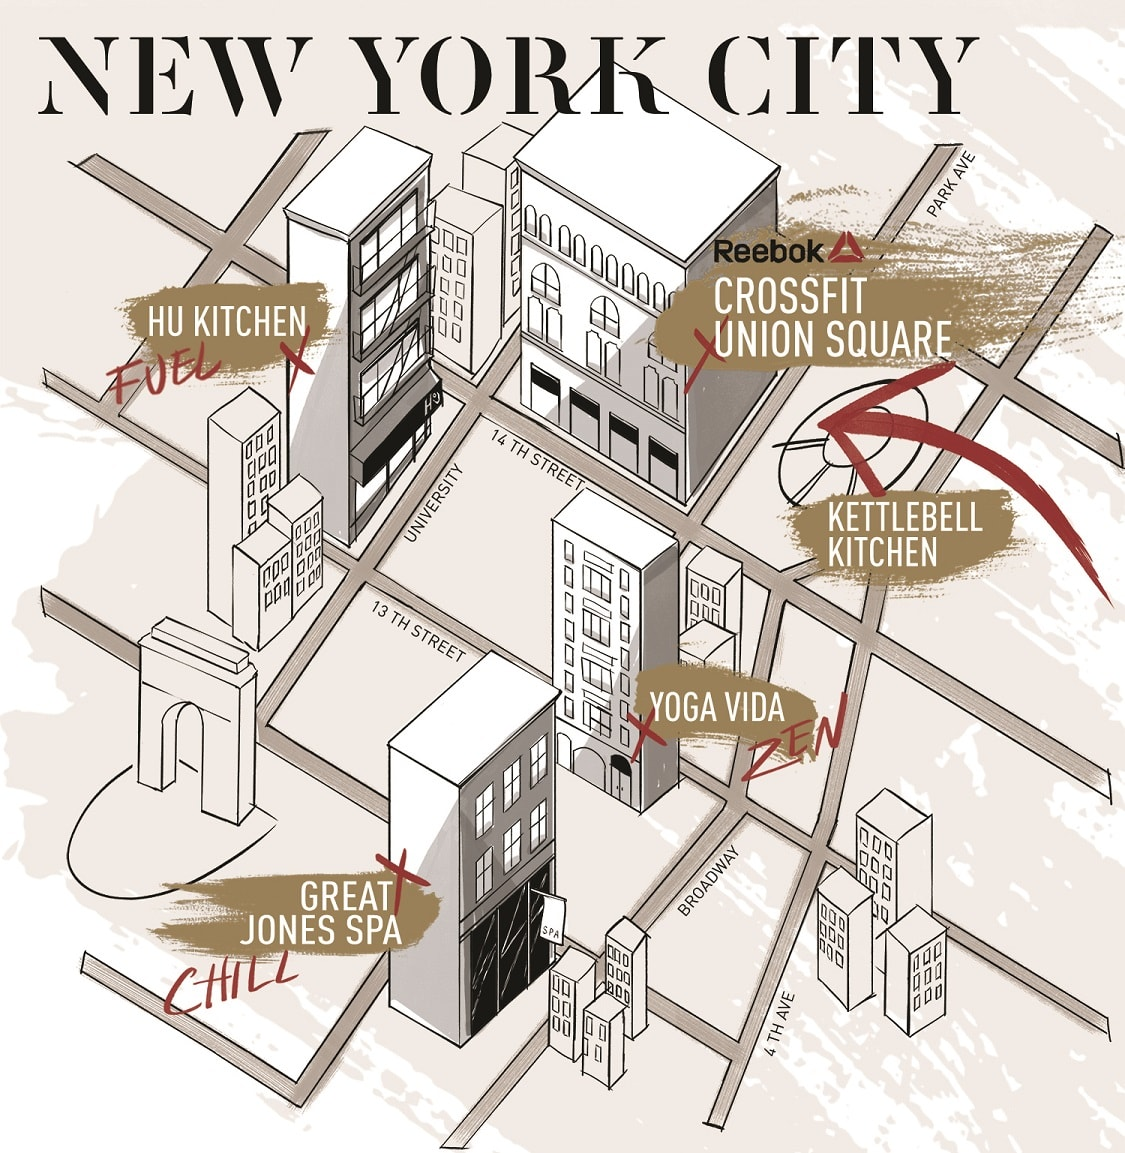 cf-travel-map-16-nyc